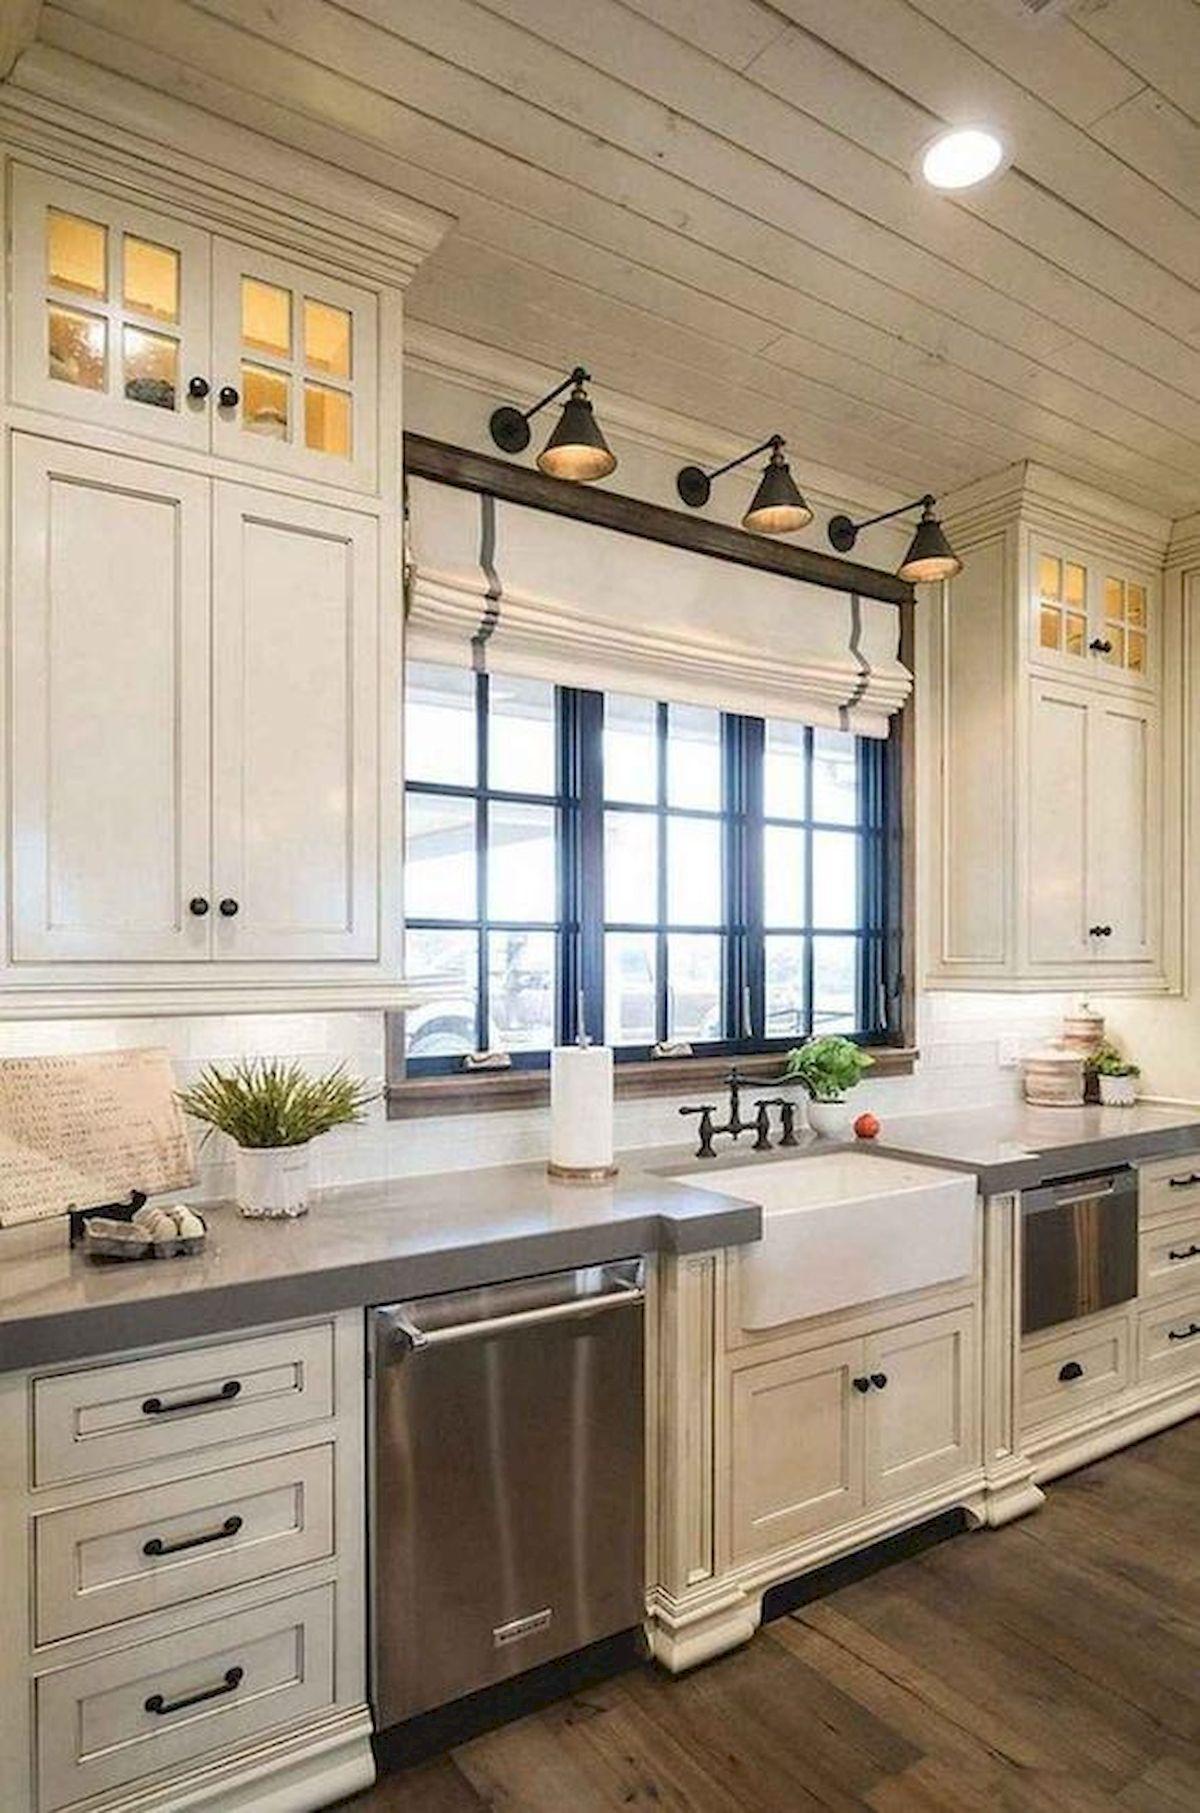 45 Easy Kitchen Decor and Design Ideas (45)